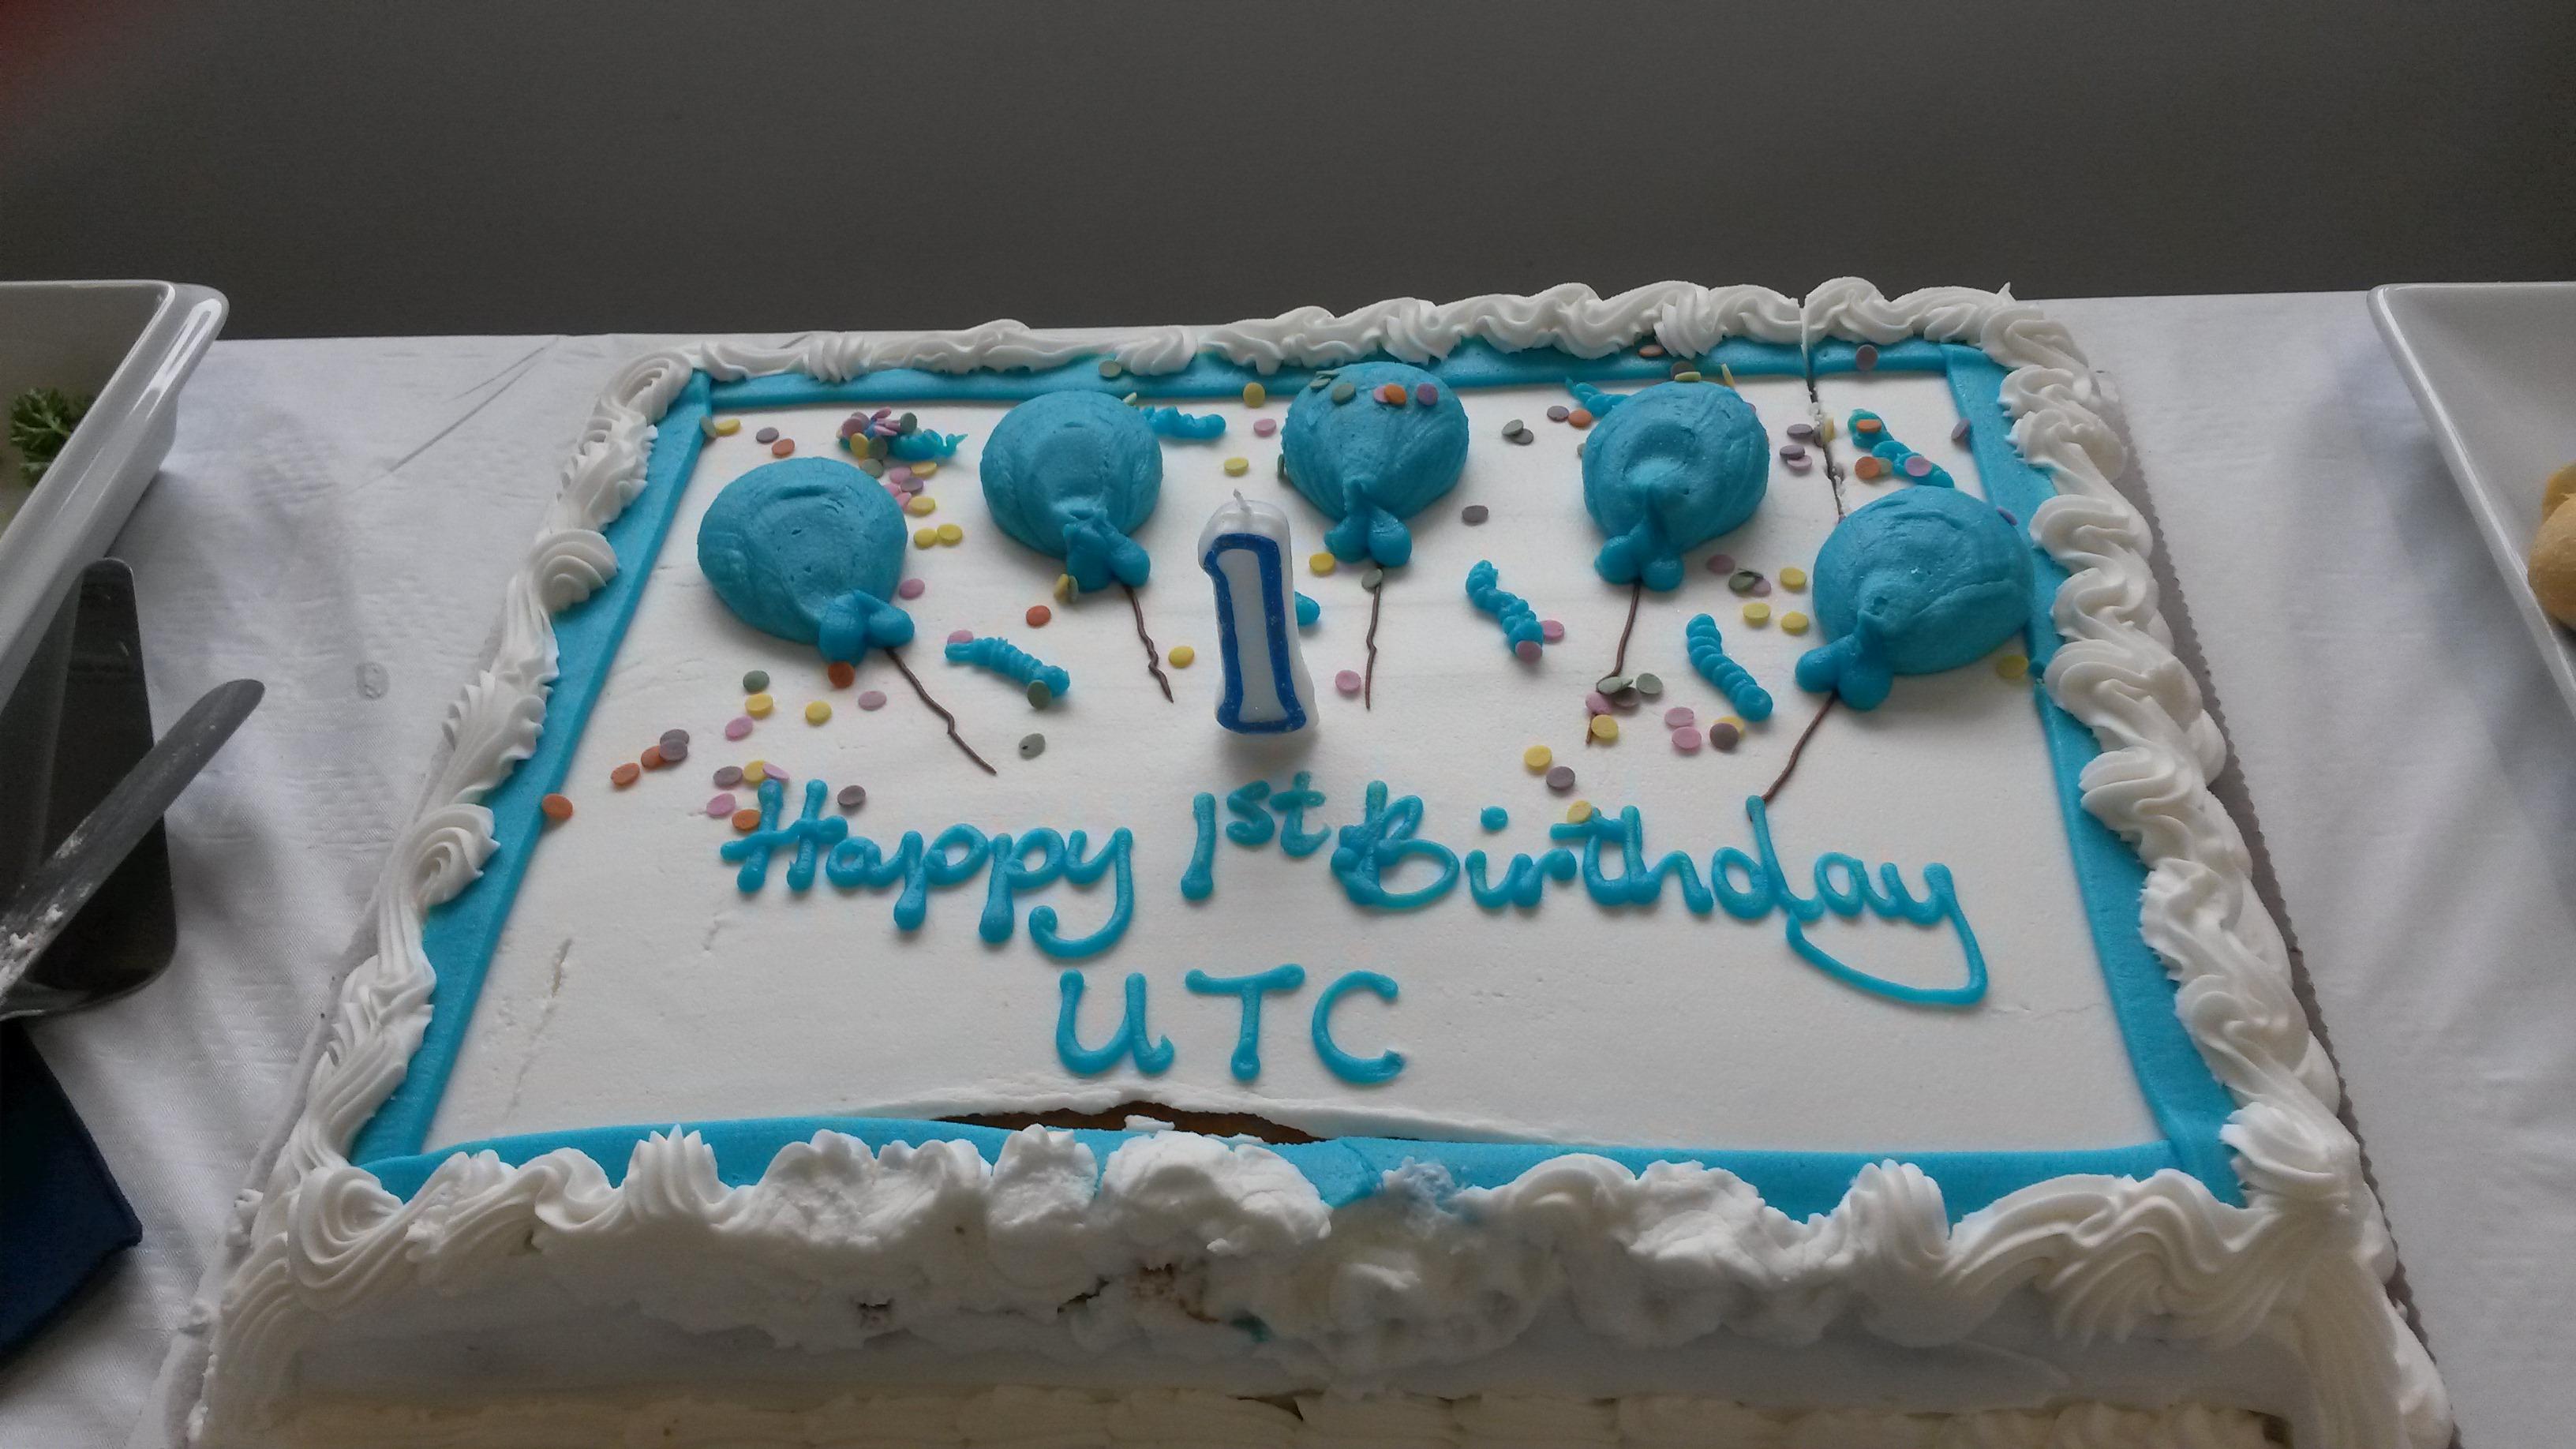 birthday-cake-utc